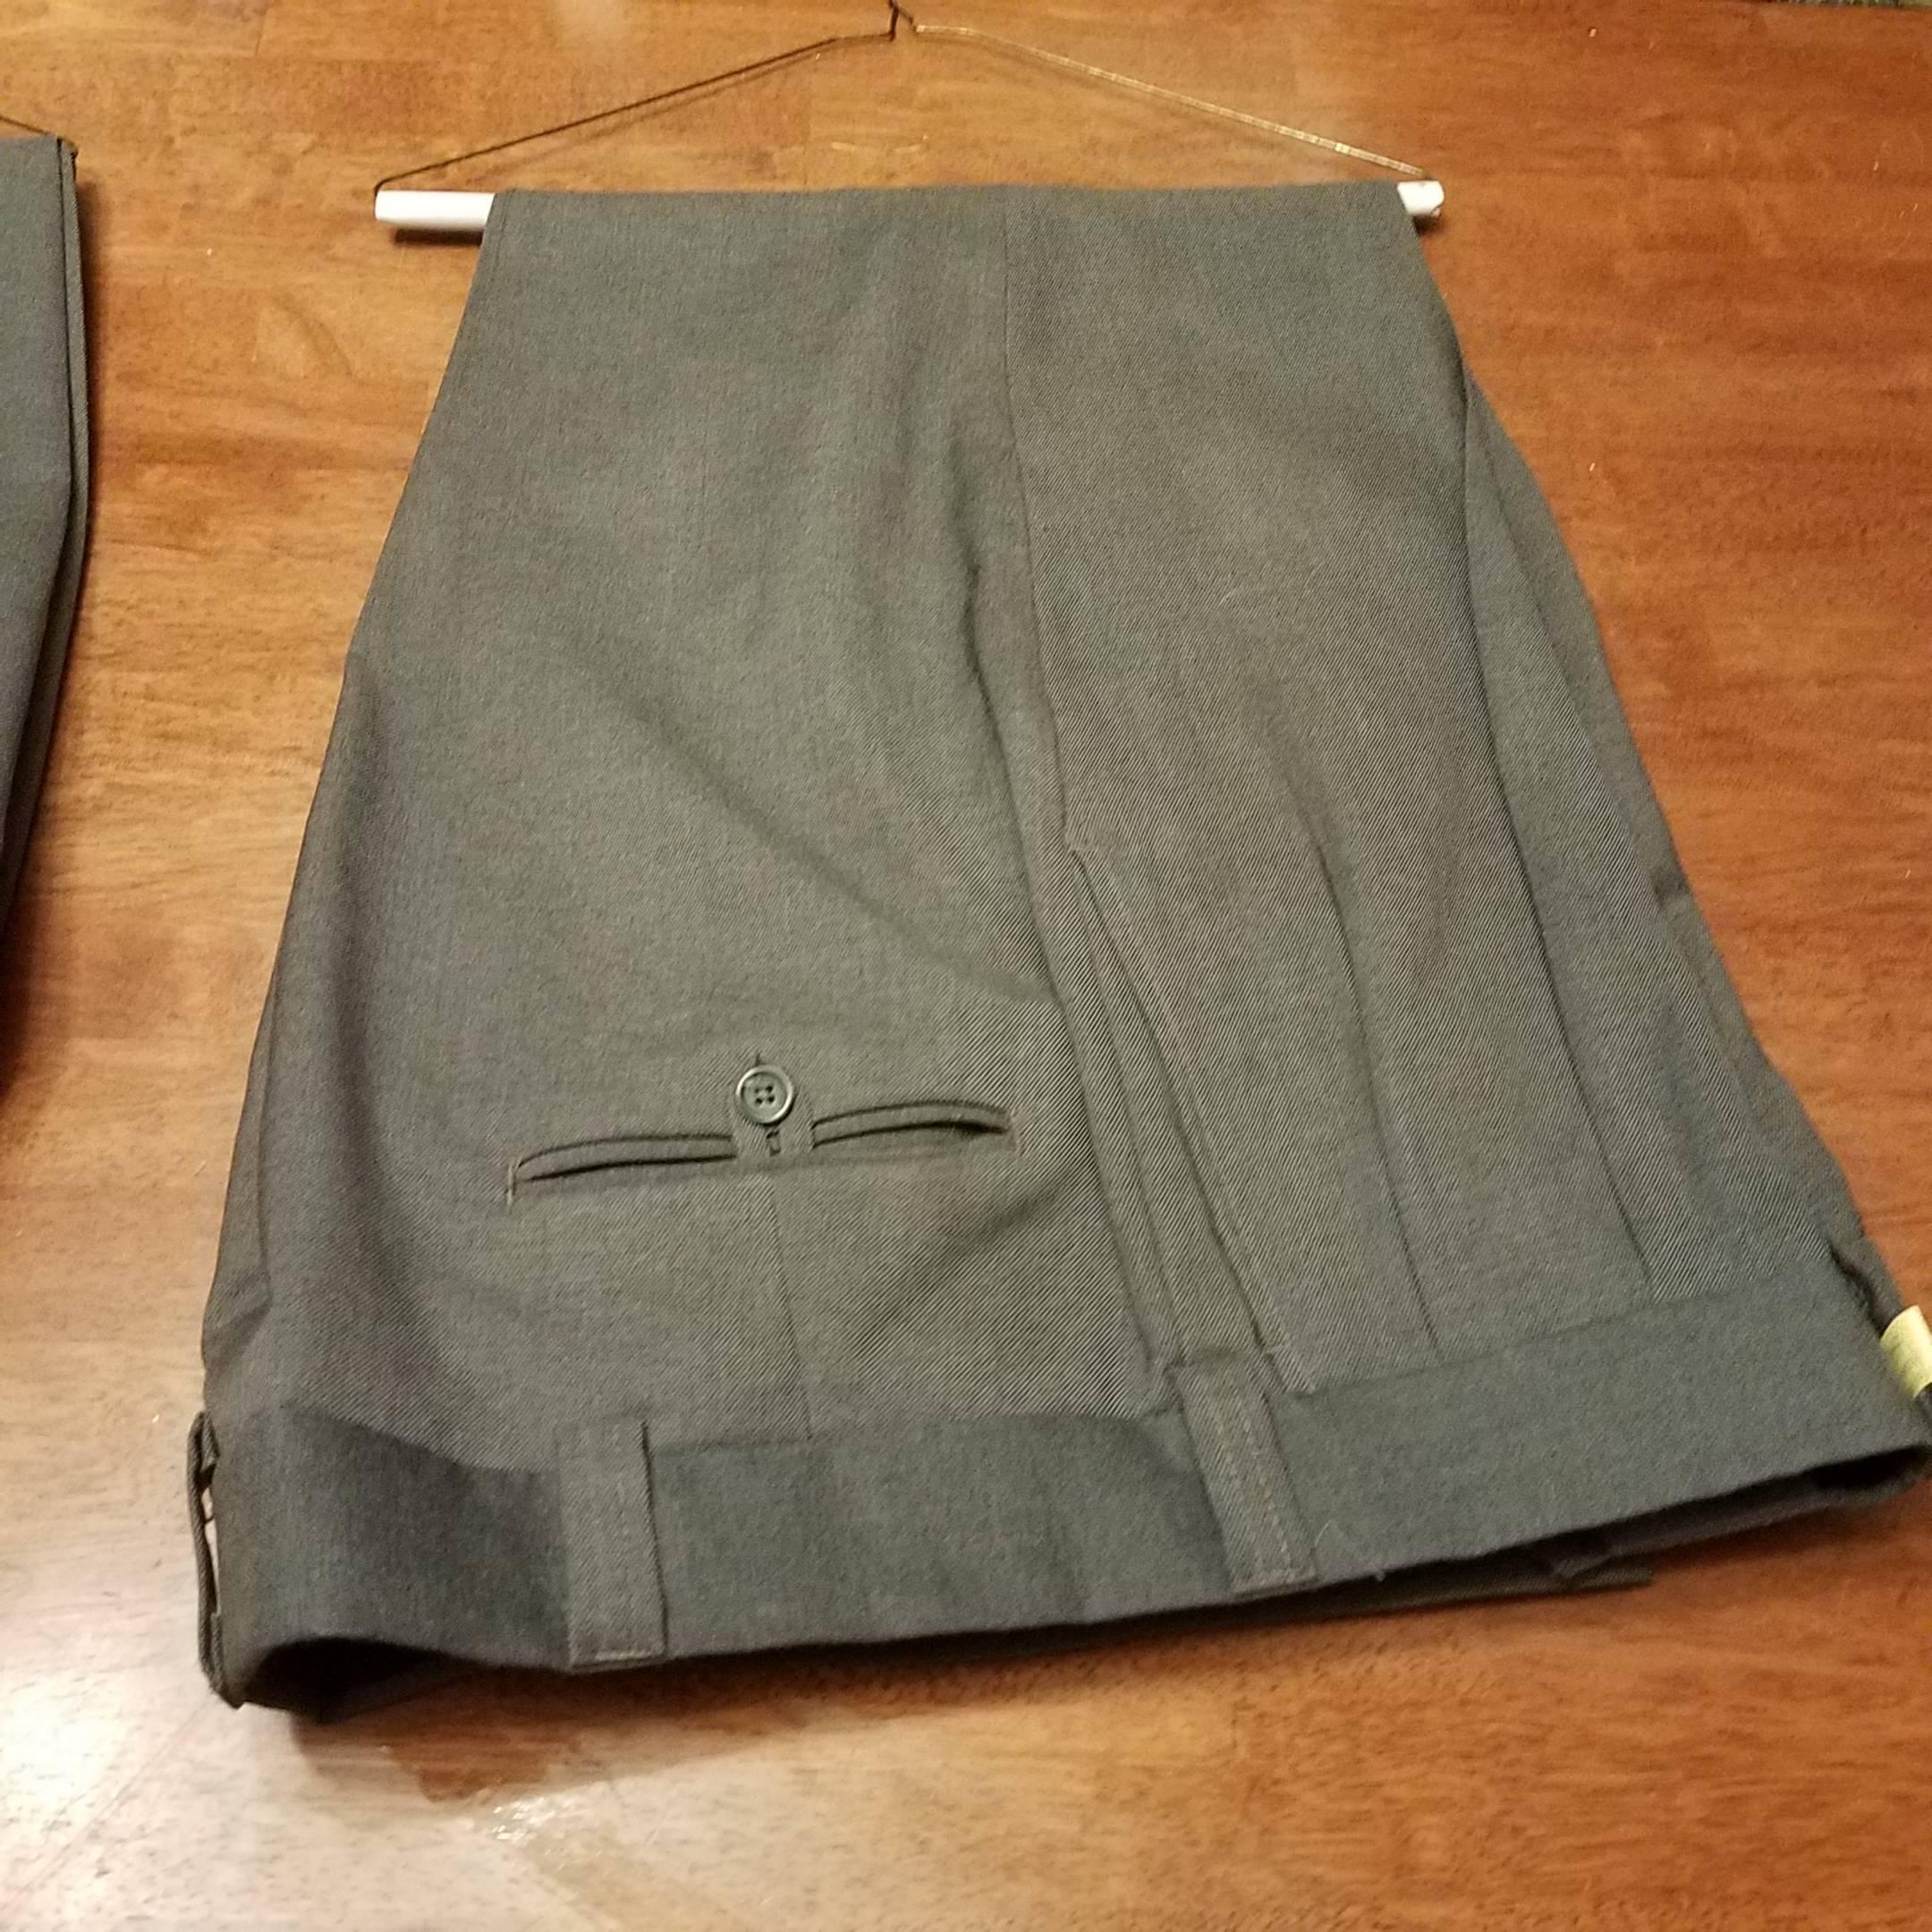 Honigs Polywool base pants Waist 40 - Buy, Sell or Trade